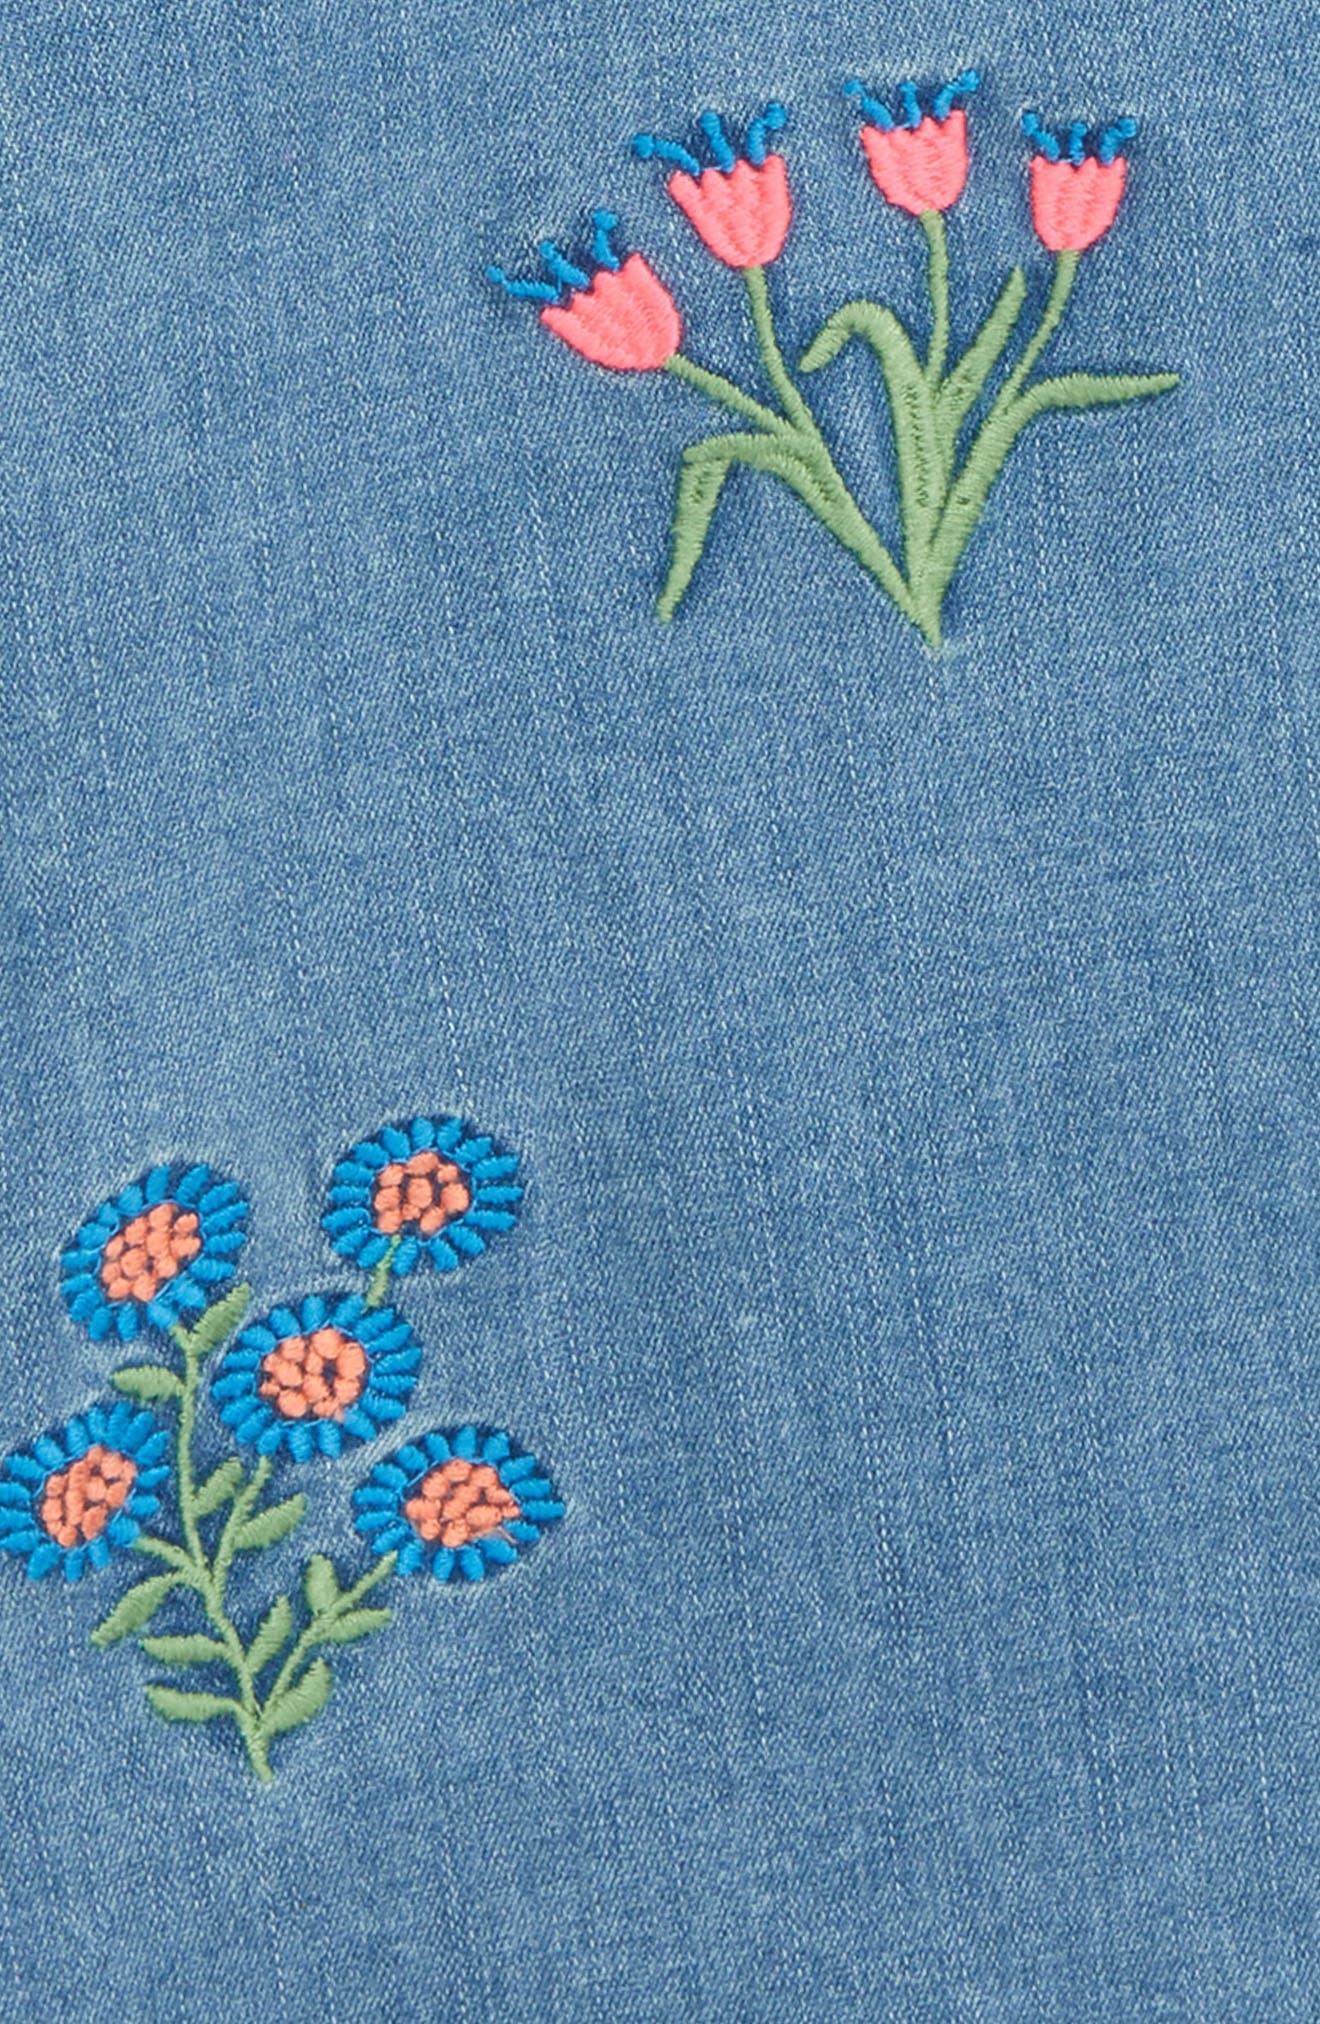 Embroidered Denim Dress,                             Alternate thumbnail 3, color,                             420